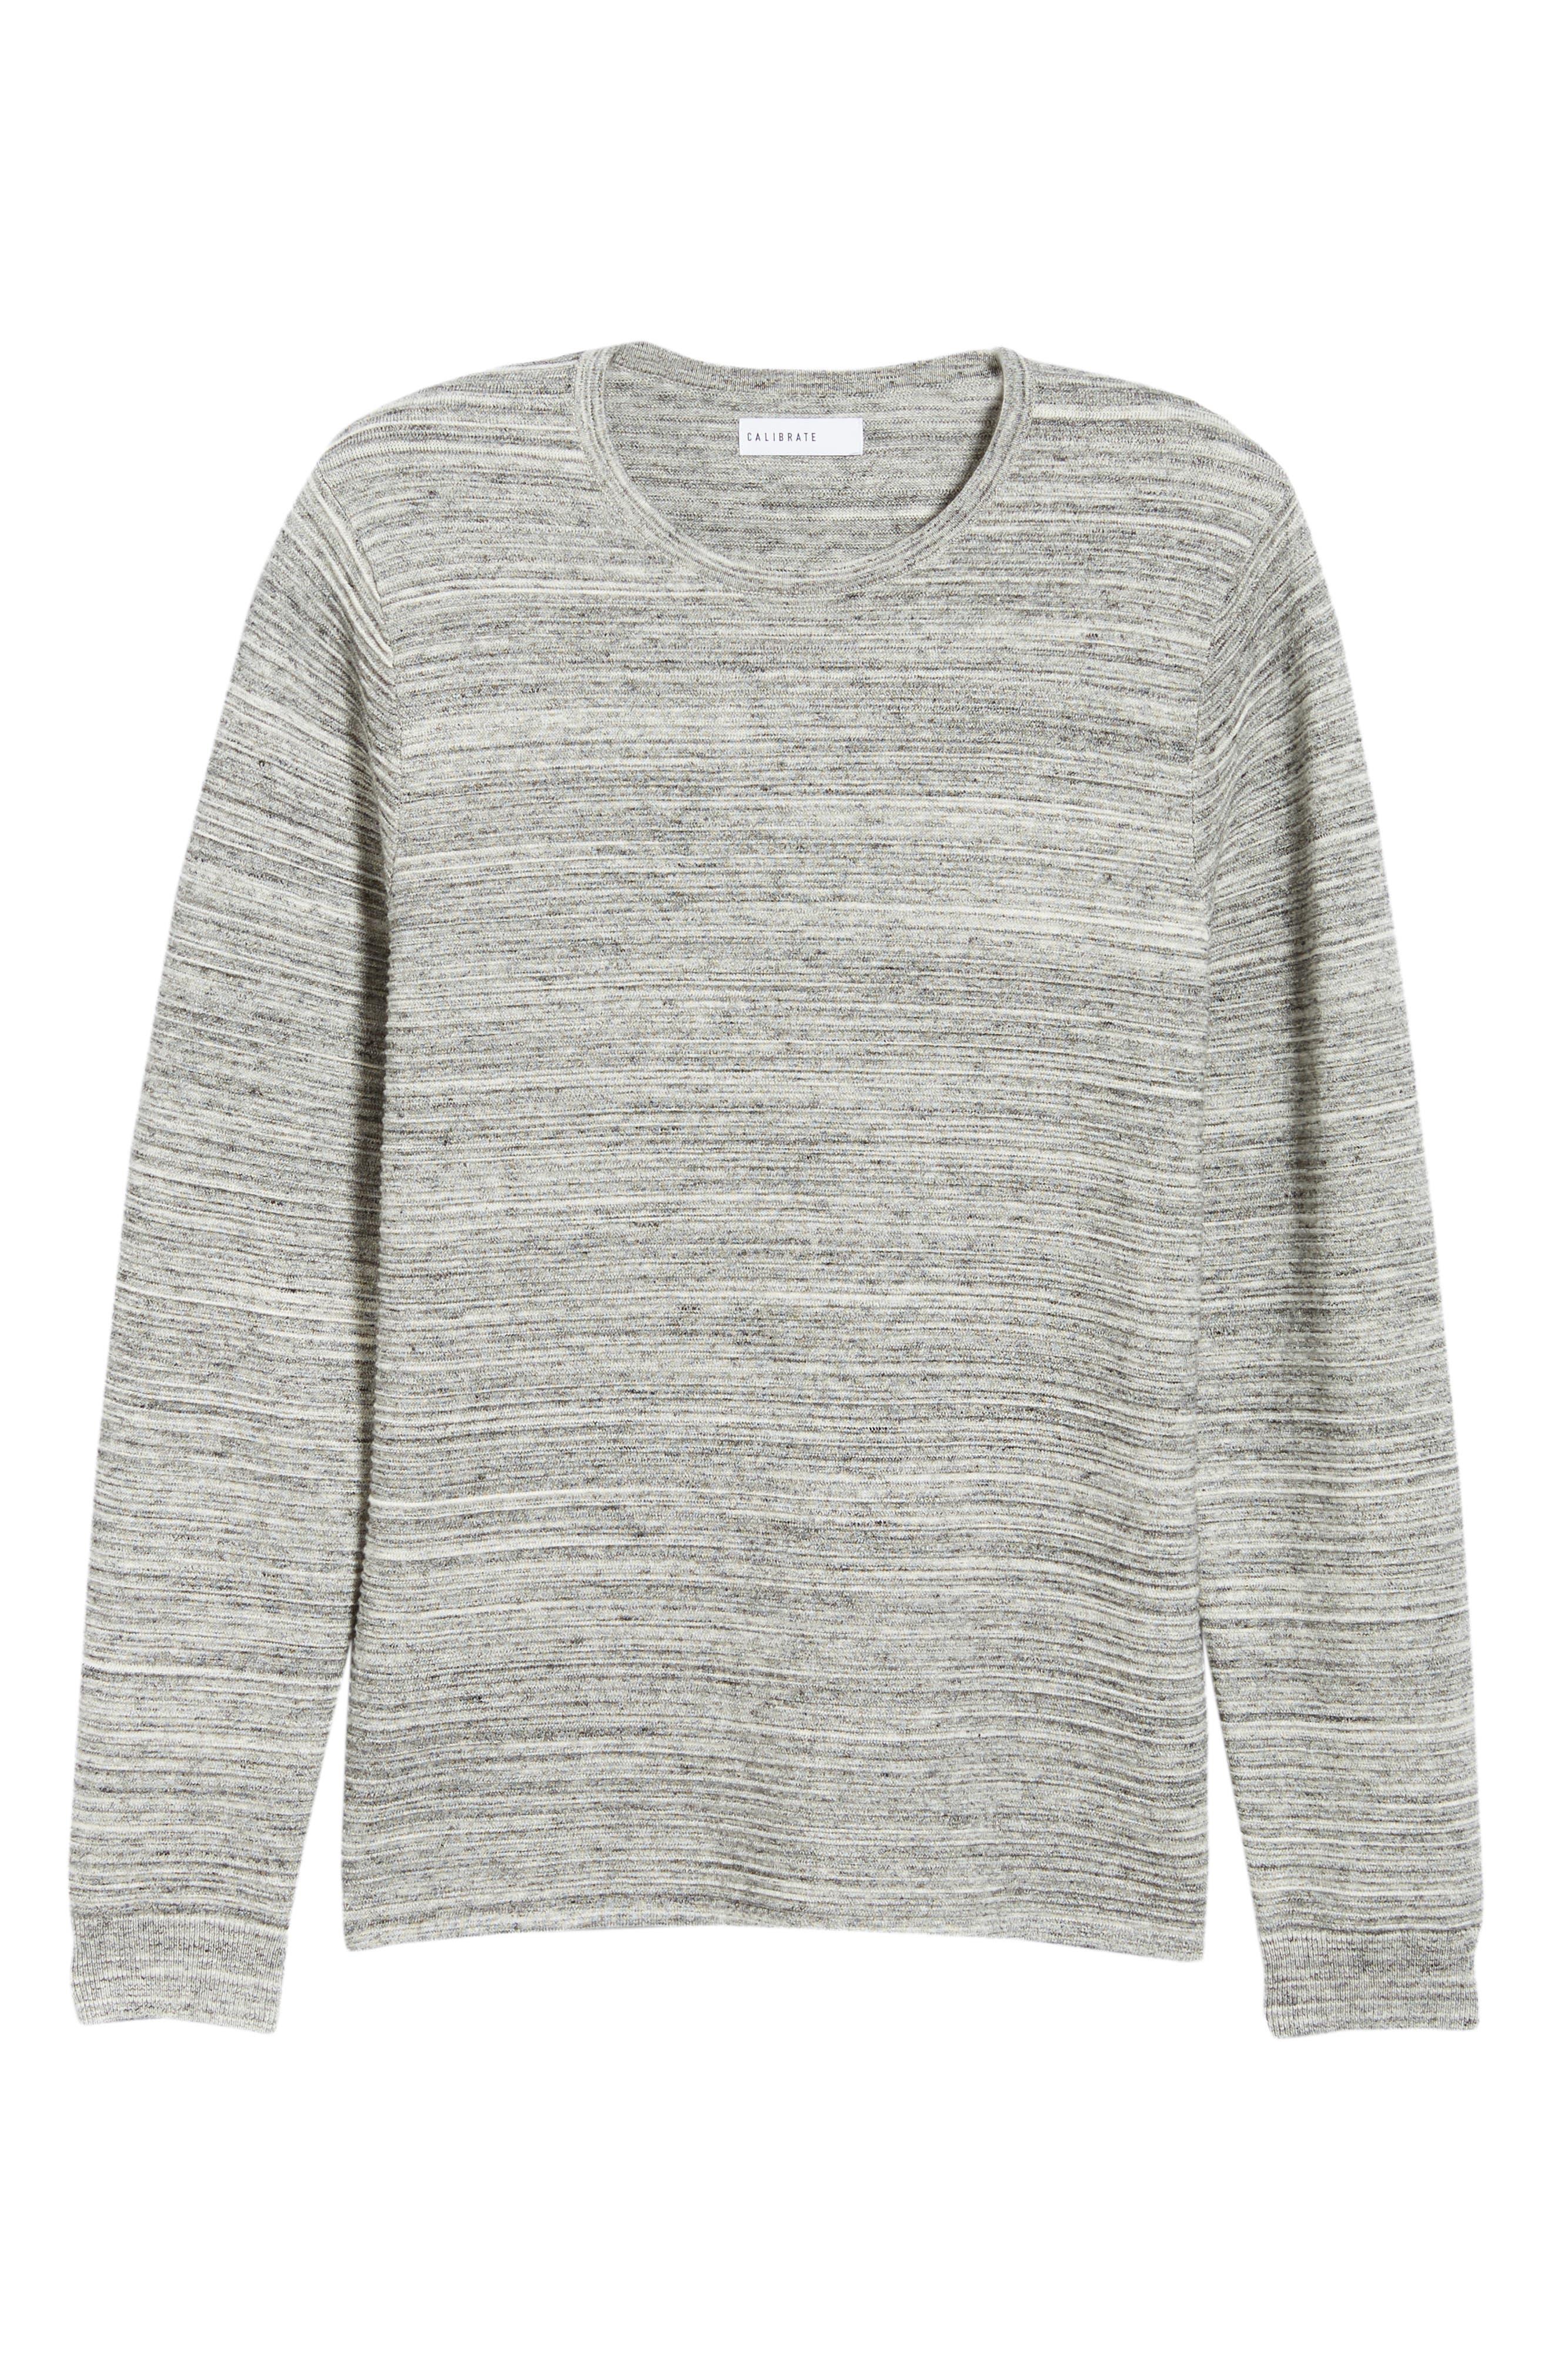 Ottoman Crewneck Sweater,                             Alternate thumbnail 6, color,                             GREY TORNADO SPACEDYE